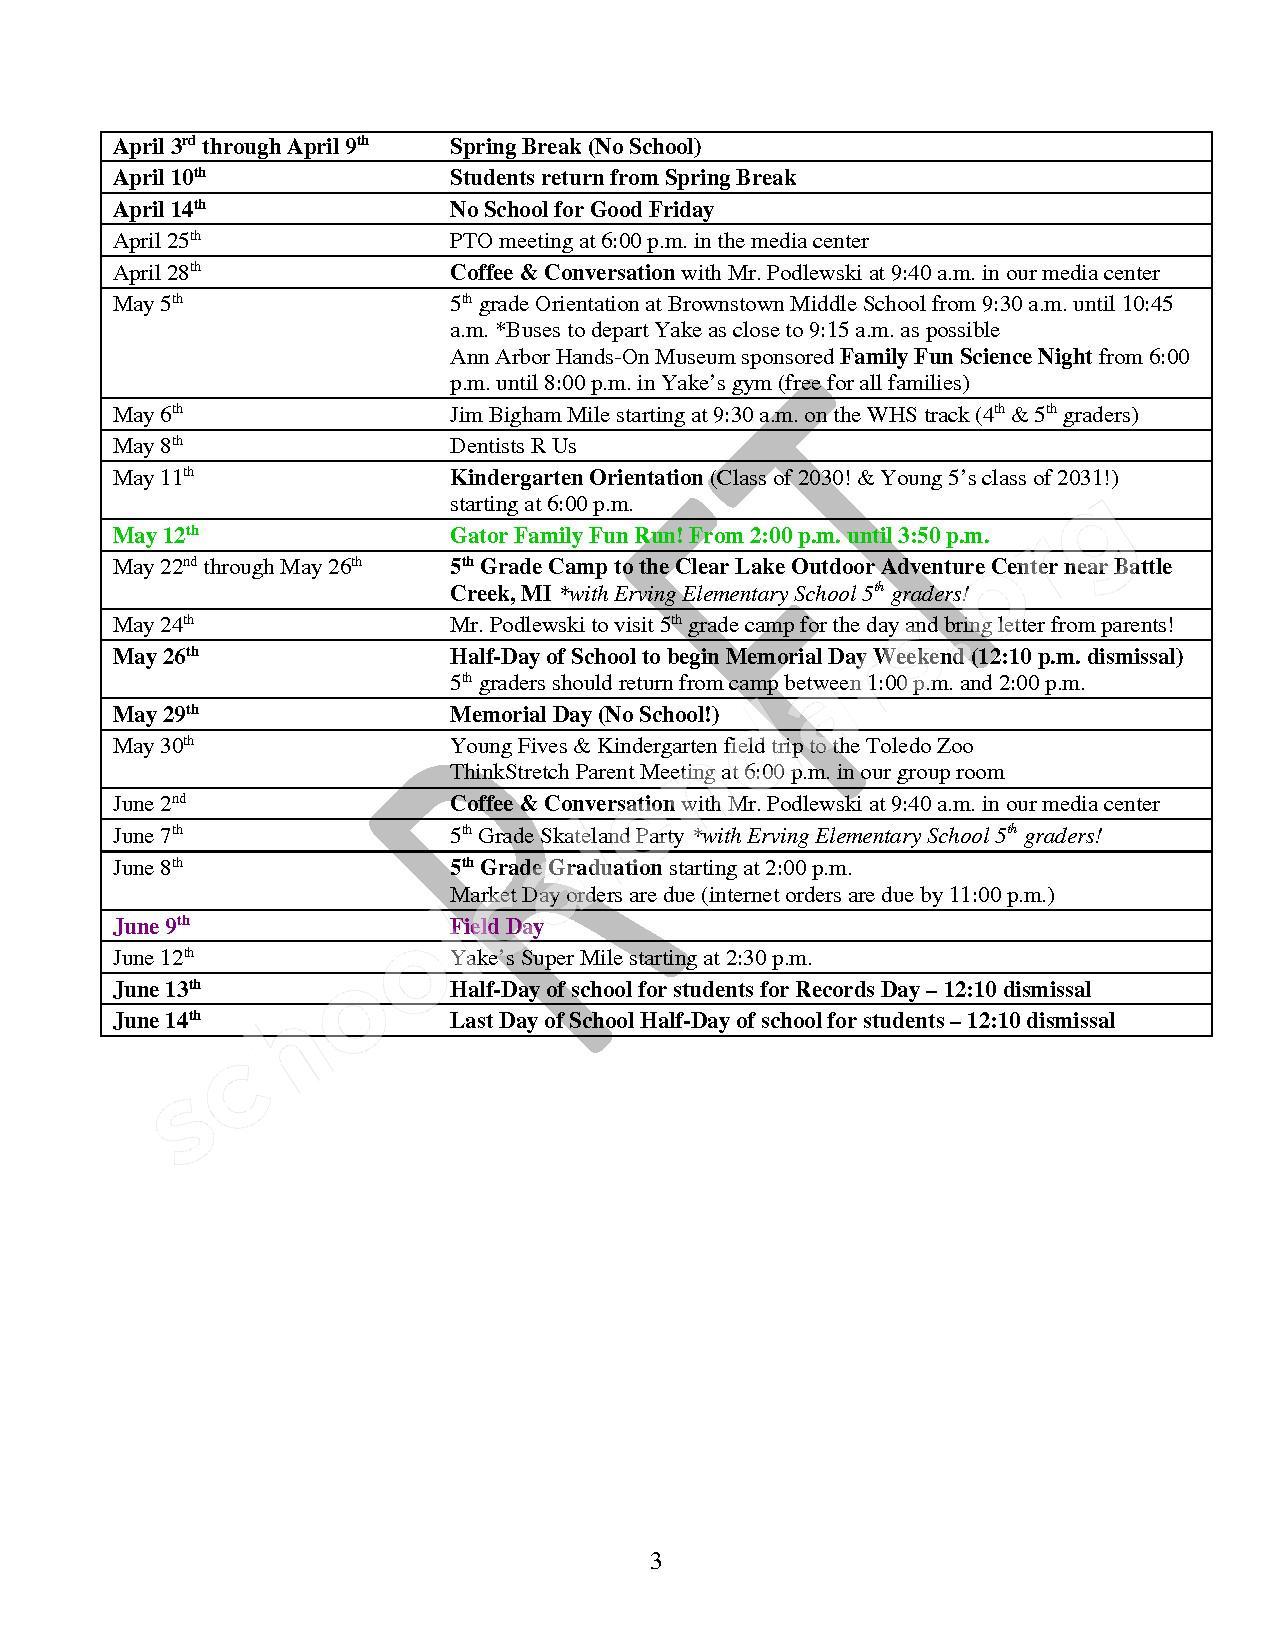 2016 - 2017 School Calendar – Bates Elementary School – page 3